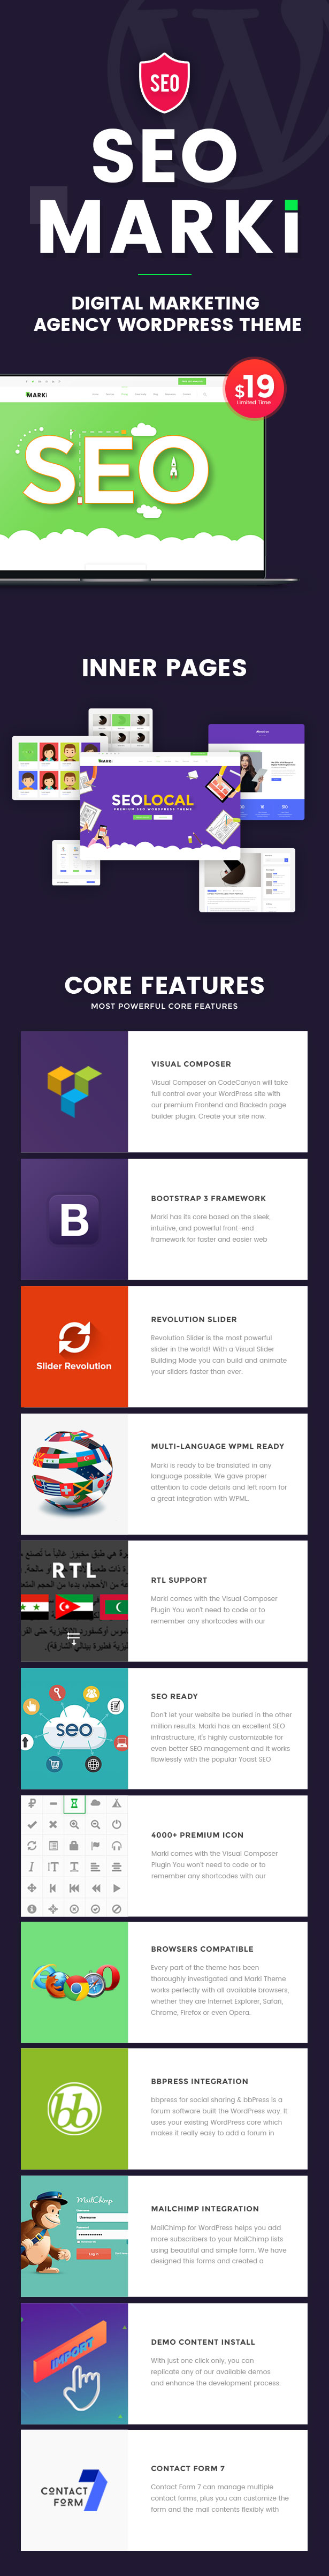 Best Digital Marketing Agency WordPress Theme